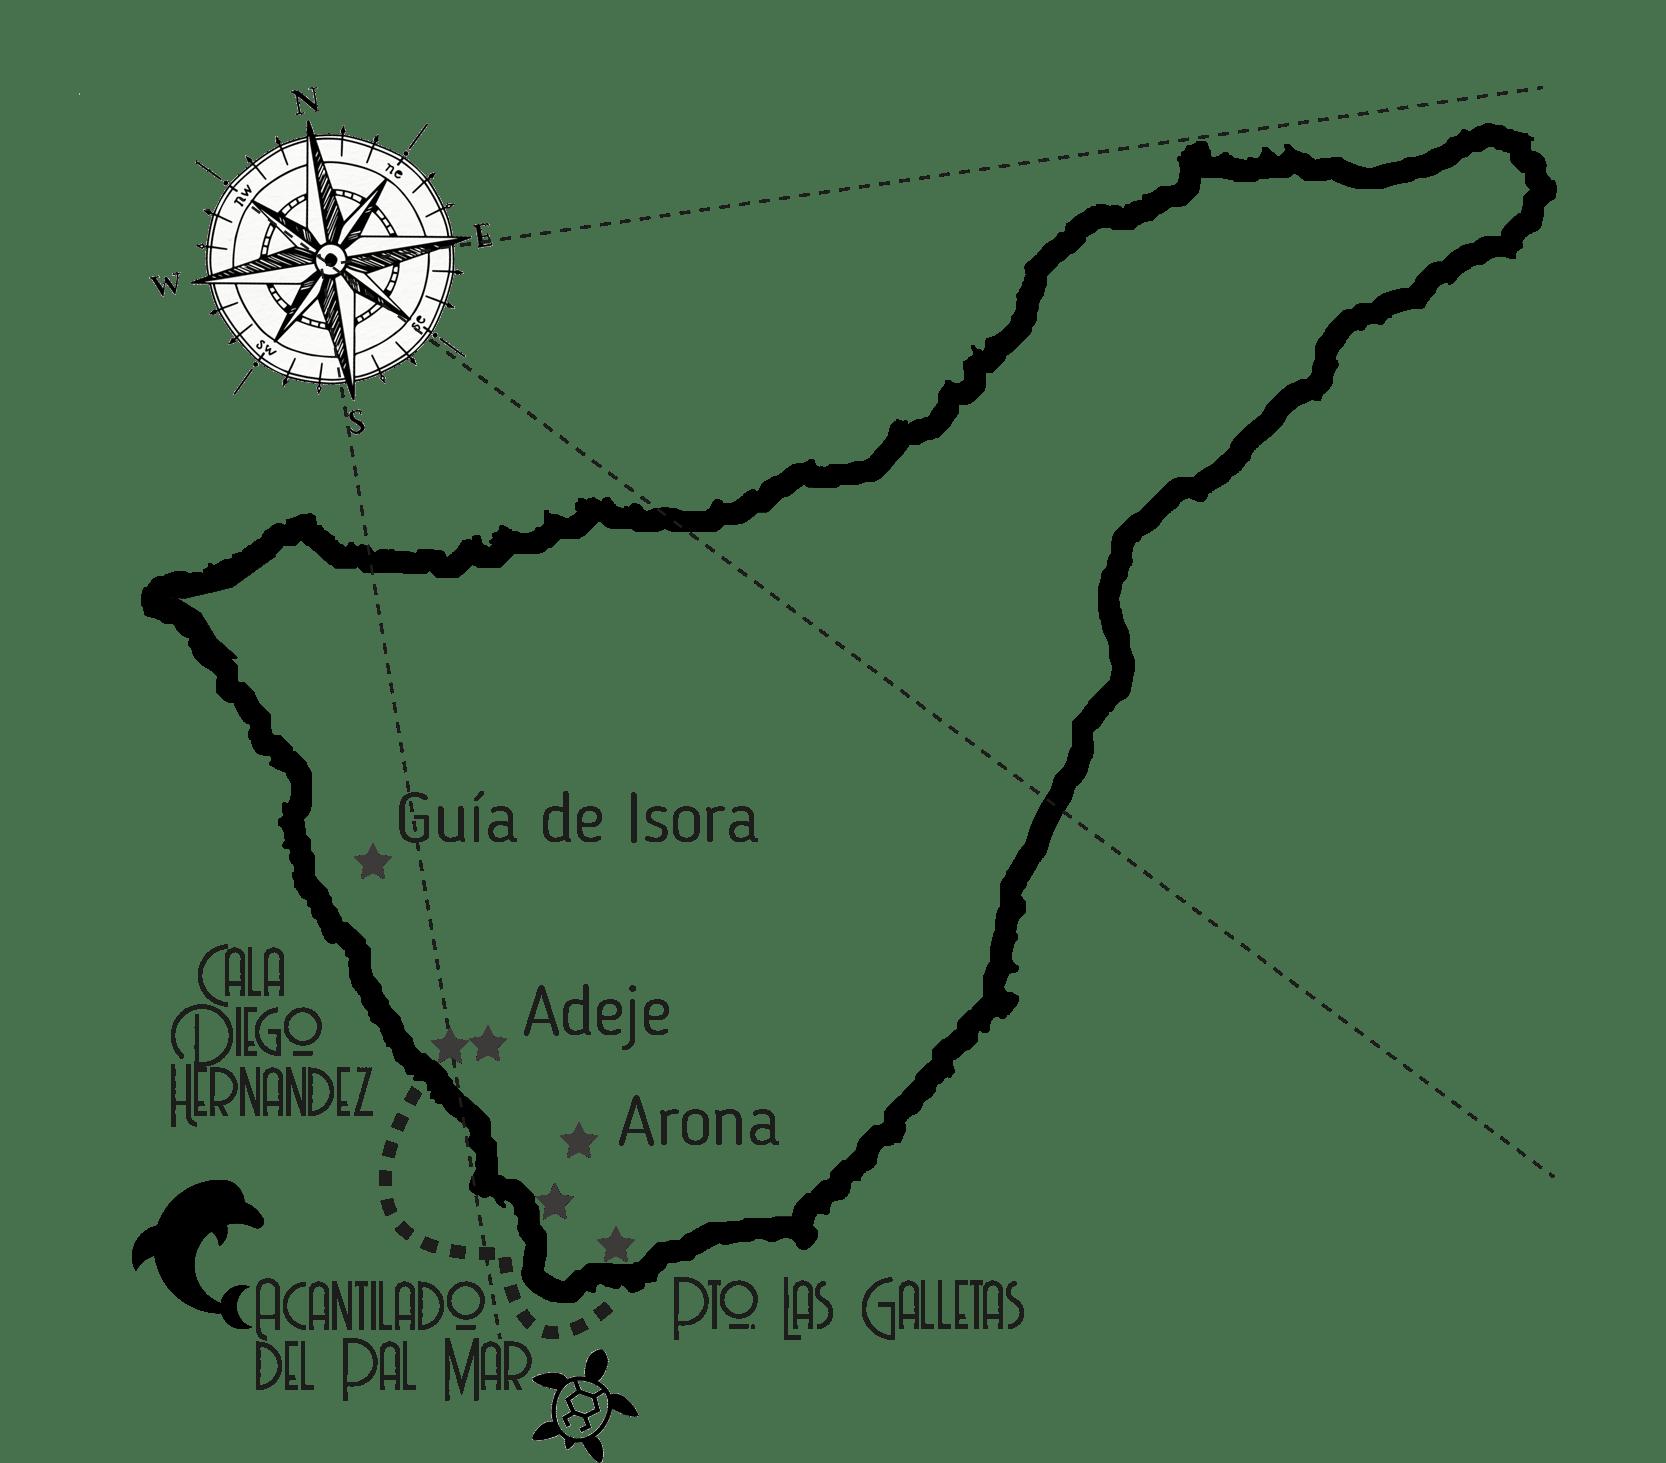 Full Day Sailing Tenerife Map